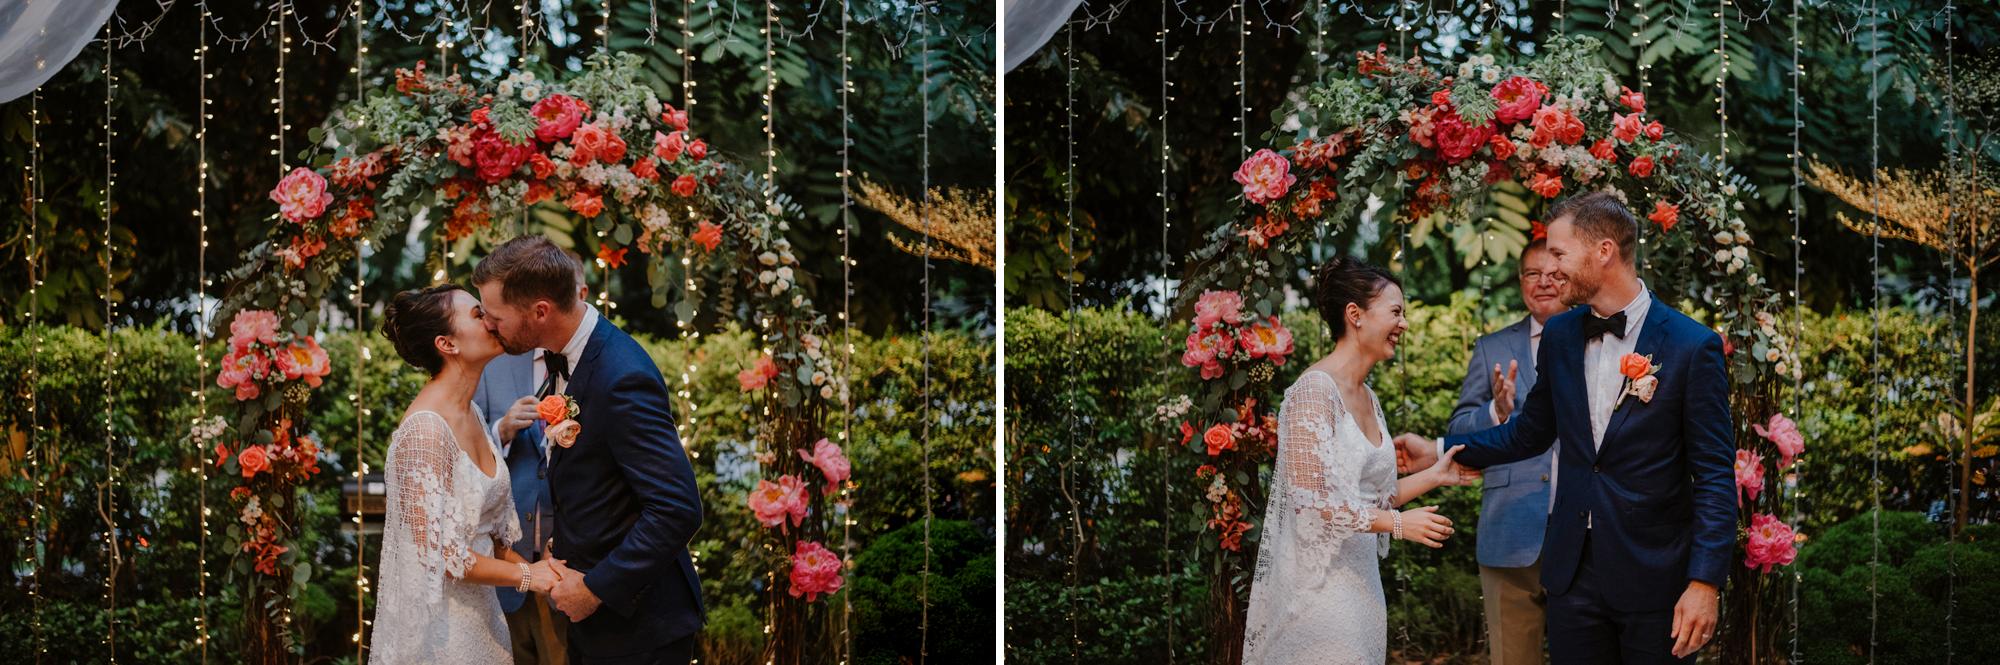 Adrian + Eugiena's Al Fresco Wedding in Singapore